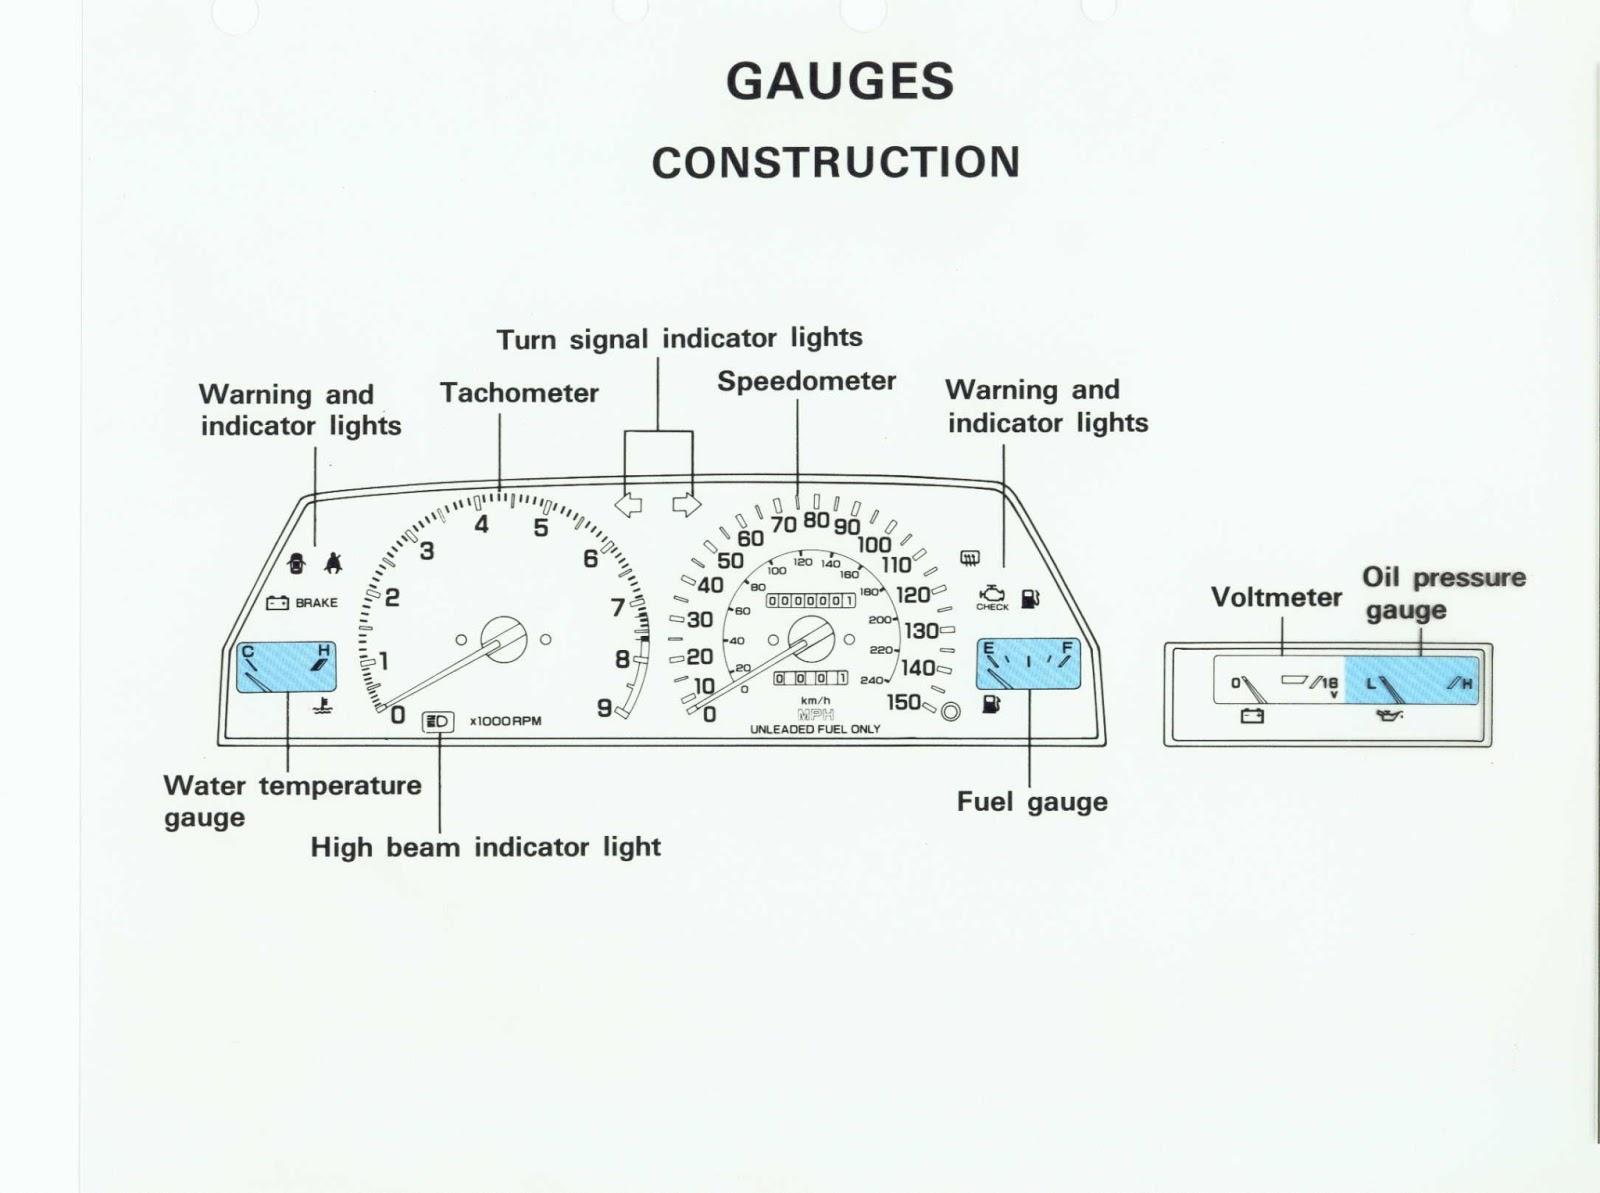 diagram kelistrikan vario diagram image wiring wiring diagram sistem kelistrikan body wiring on diagram kelistrikan vario 110